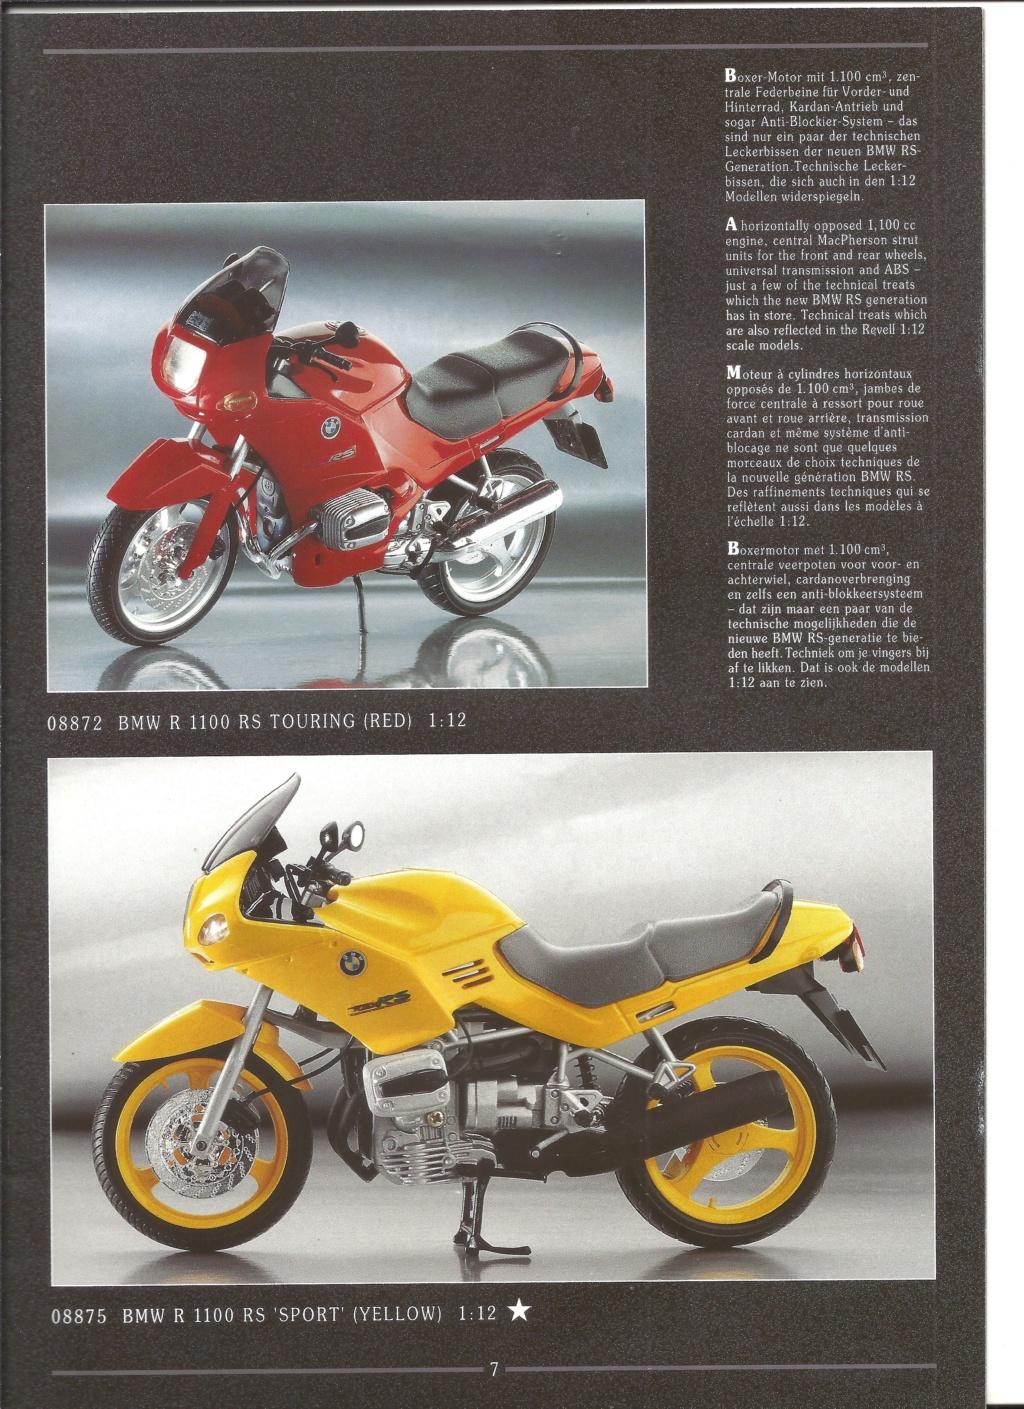 [REVELL 1995] Catalogue METAL miniatures 1995  Revell35